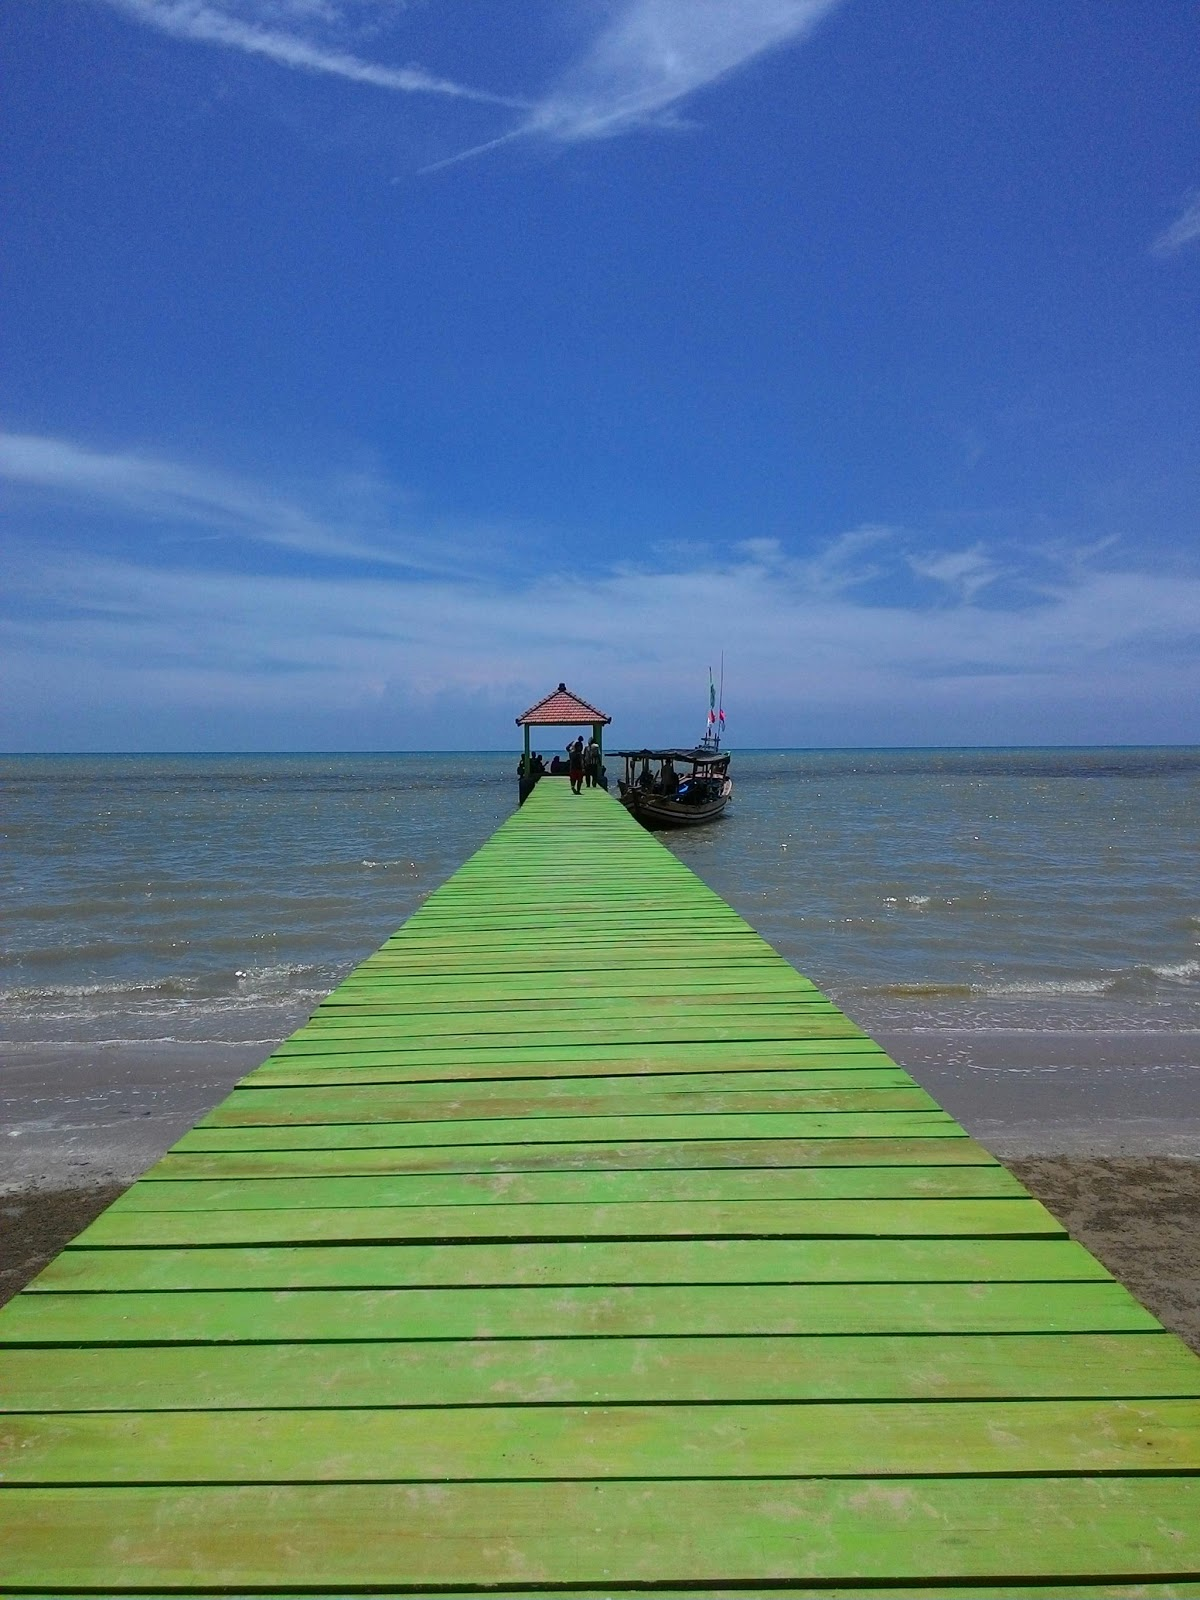 Dekmoko Destinasi Pantai Karang Jahe Rembang Tadi Informasi Tentang Kabupaten